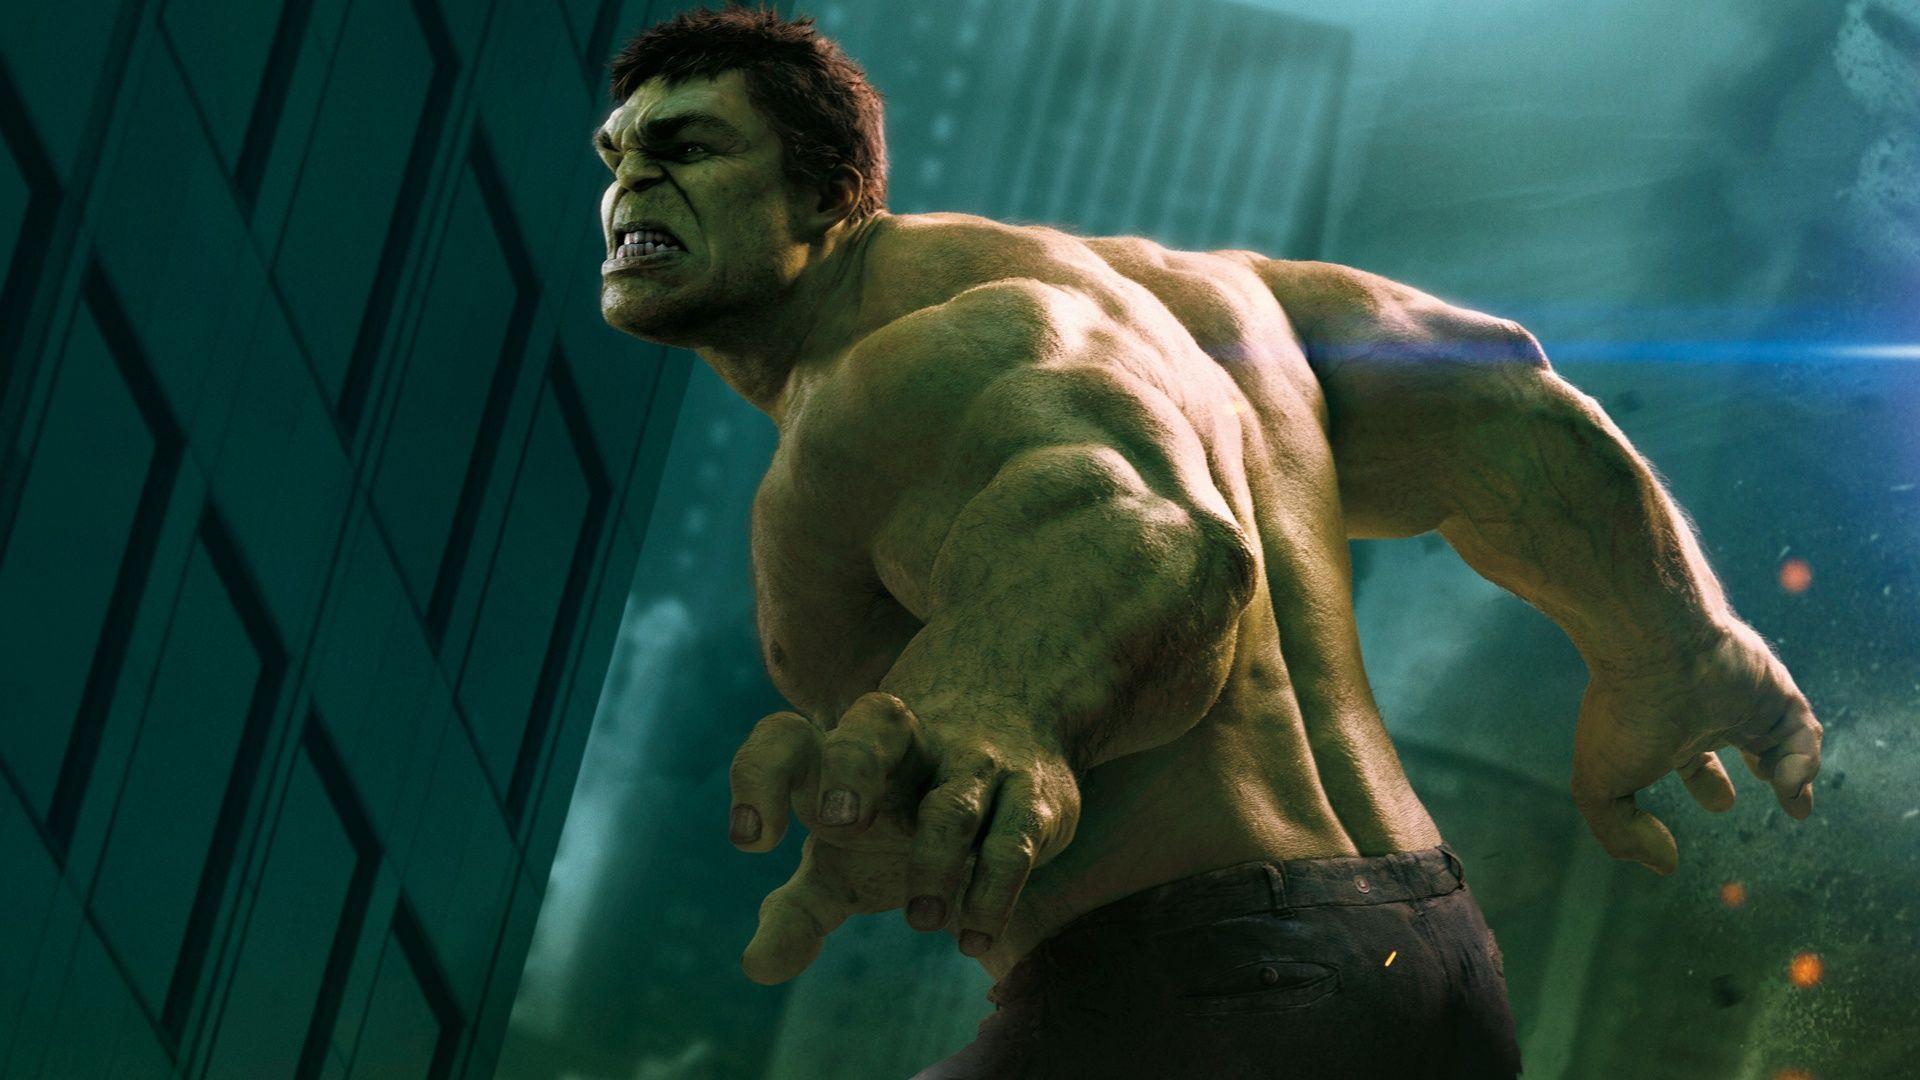 Hd wallpaper hulk - Hd Wallpapers Widescreen 1080p 3d Hulk In The Avengers Wallpapers Hd 1080p Hd